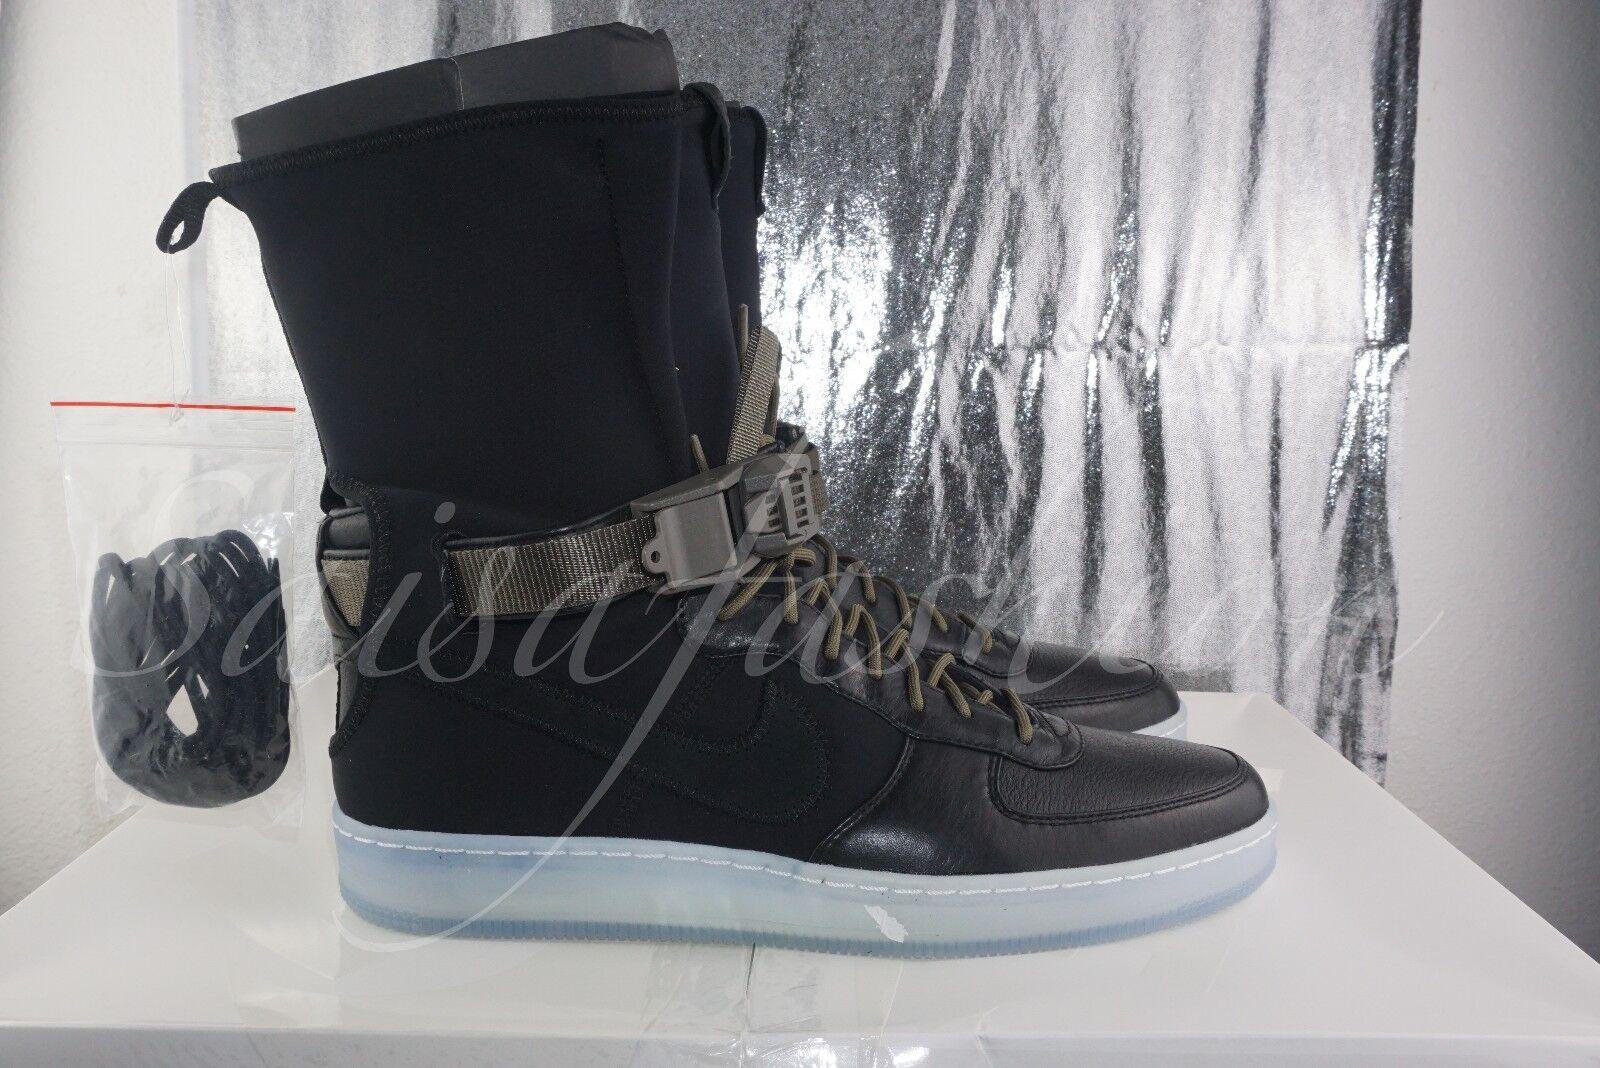 Nike X Acronym Air Force 1 AF1 Downtown HI SP Black Olive Clear 649941-003 Sz 11